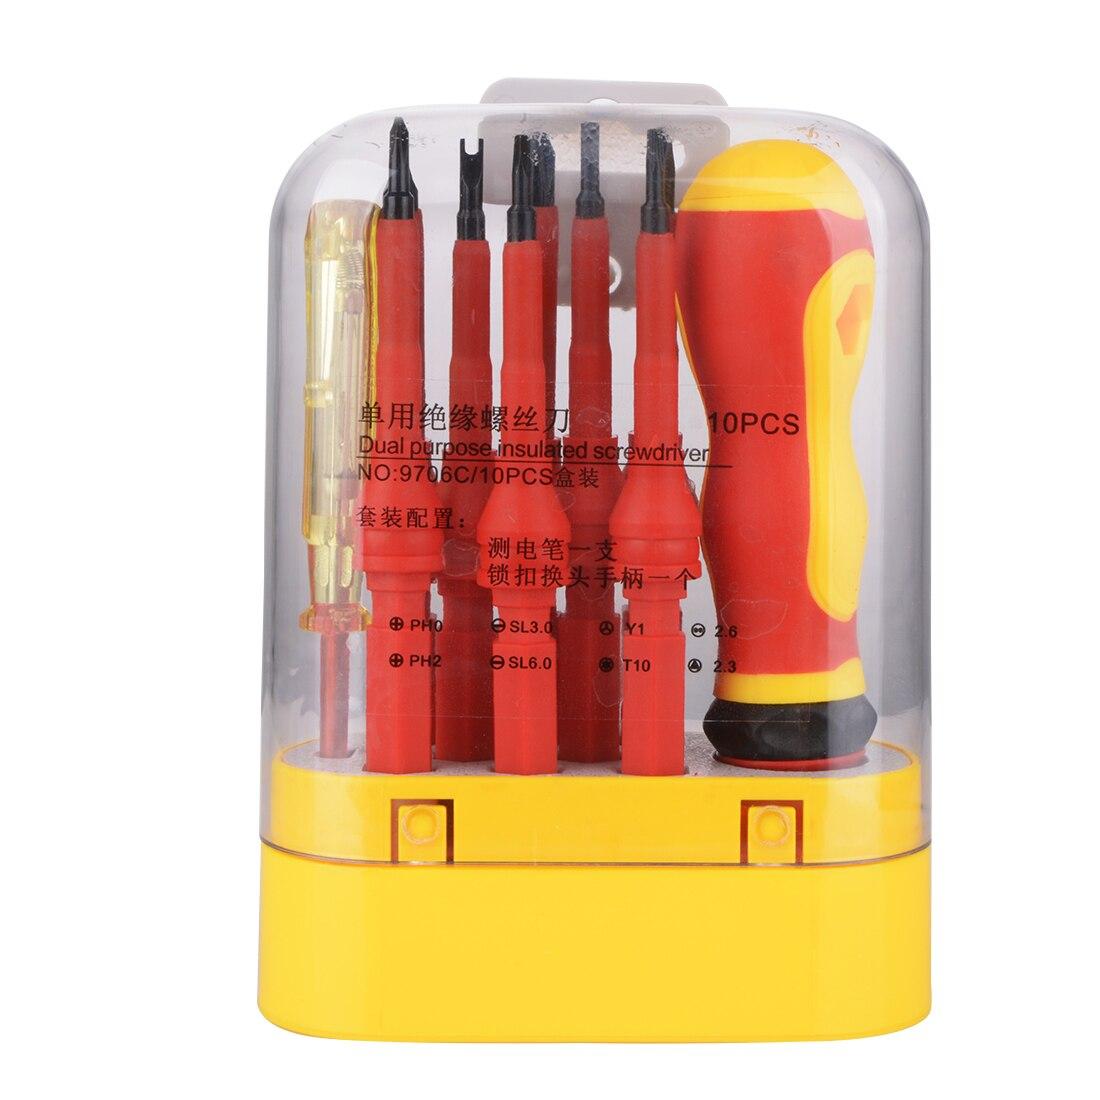 10 In 1 Multifunction Electrician Insulated Screwdriver Set Multi head  Non slip Chrome Vanadium Alloy Screwdrivers Set Tool|Screwdriver| |  - title=